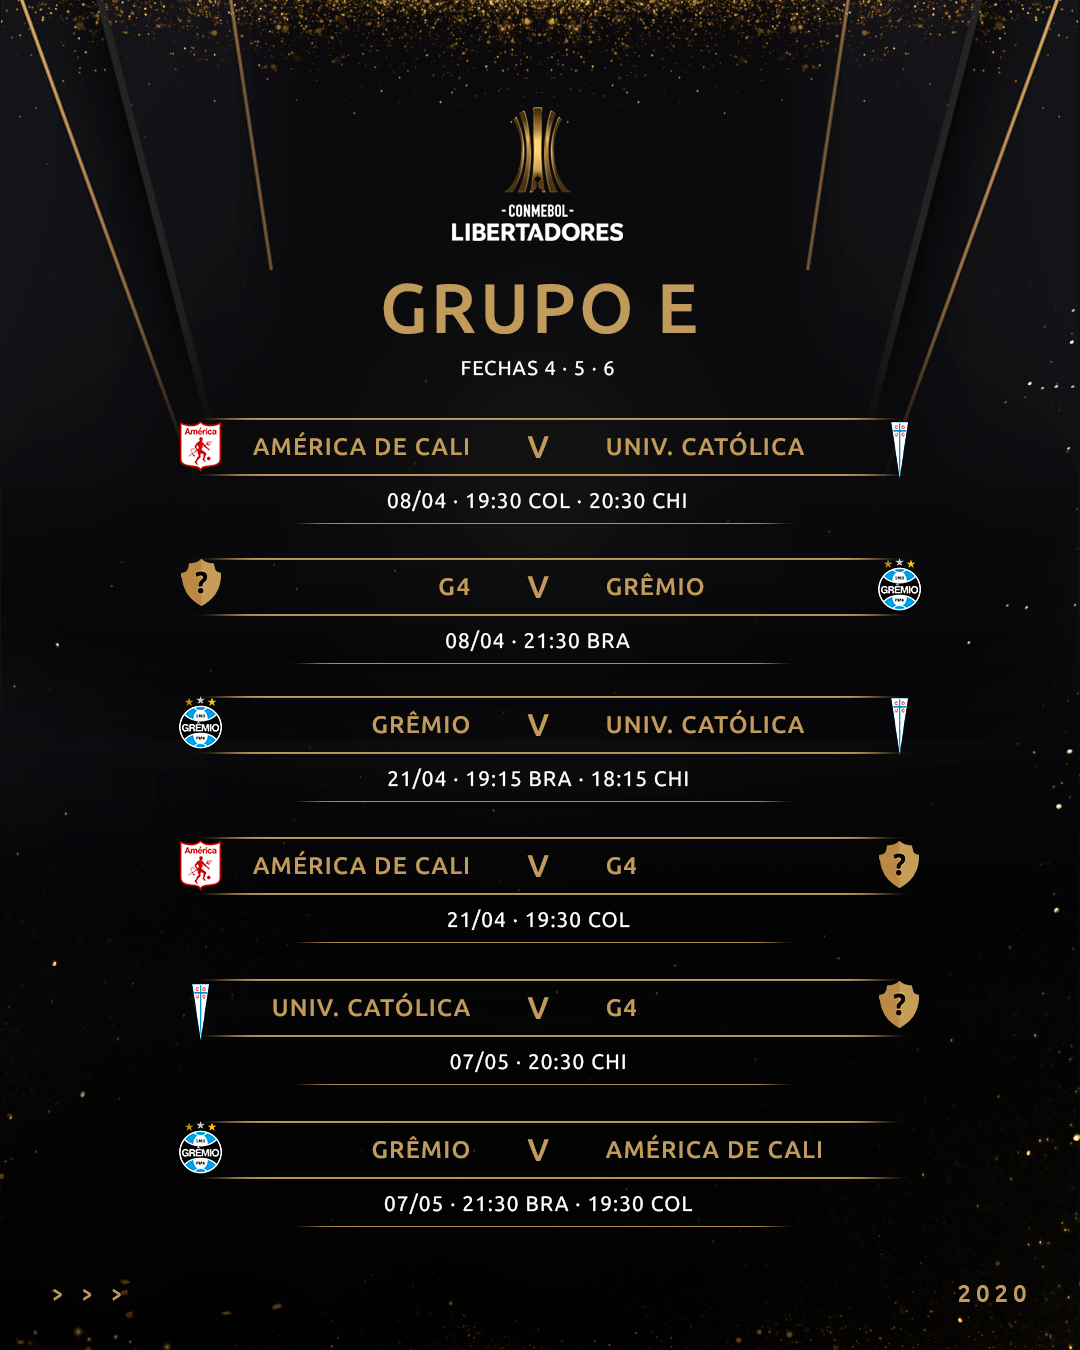 Grupo E Fixture